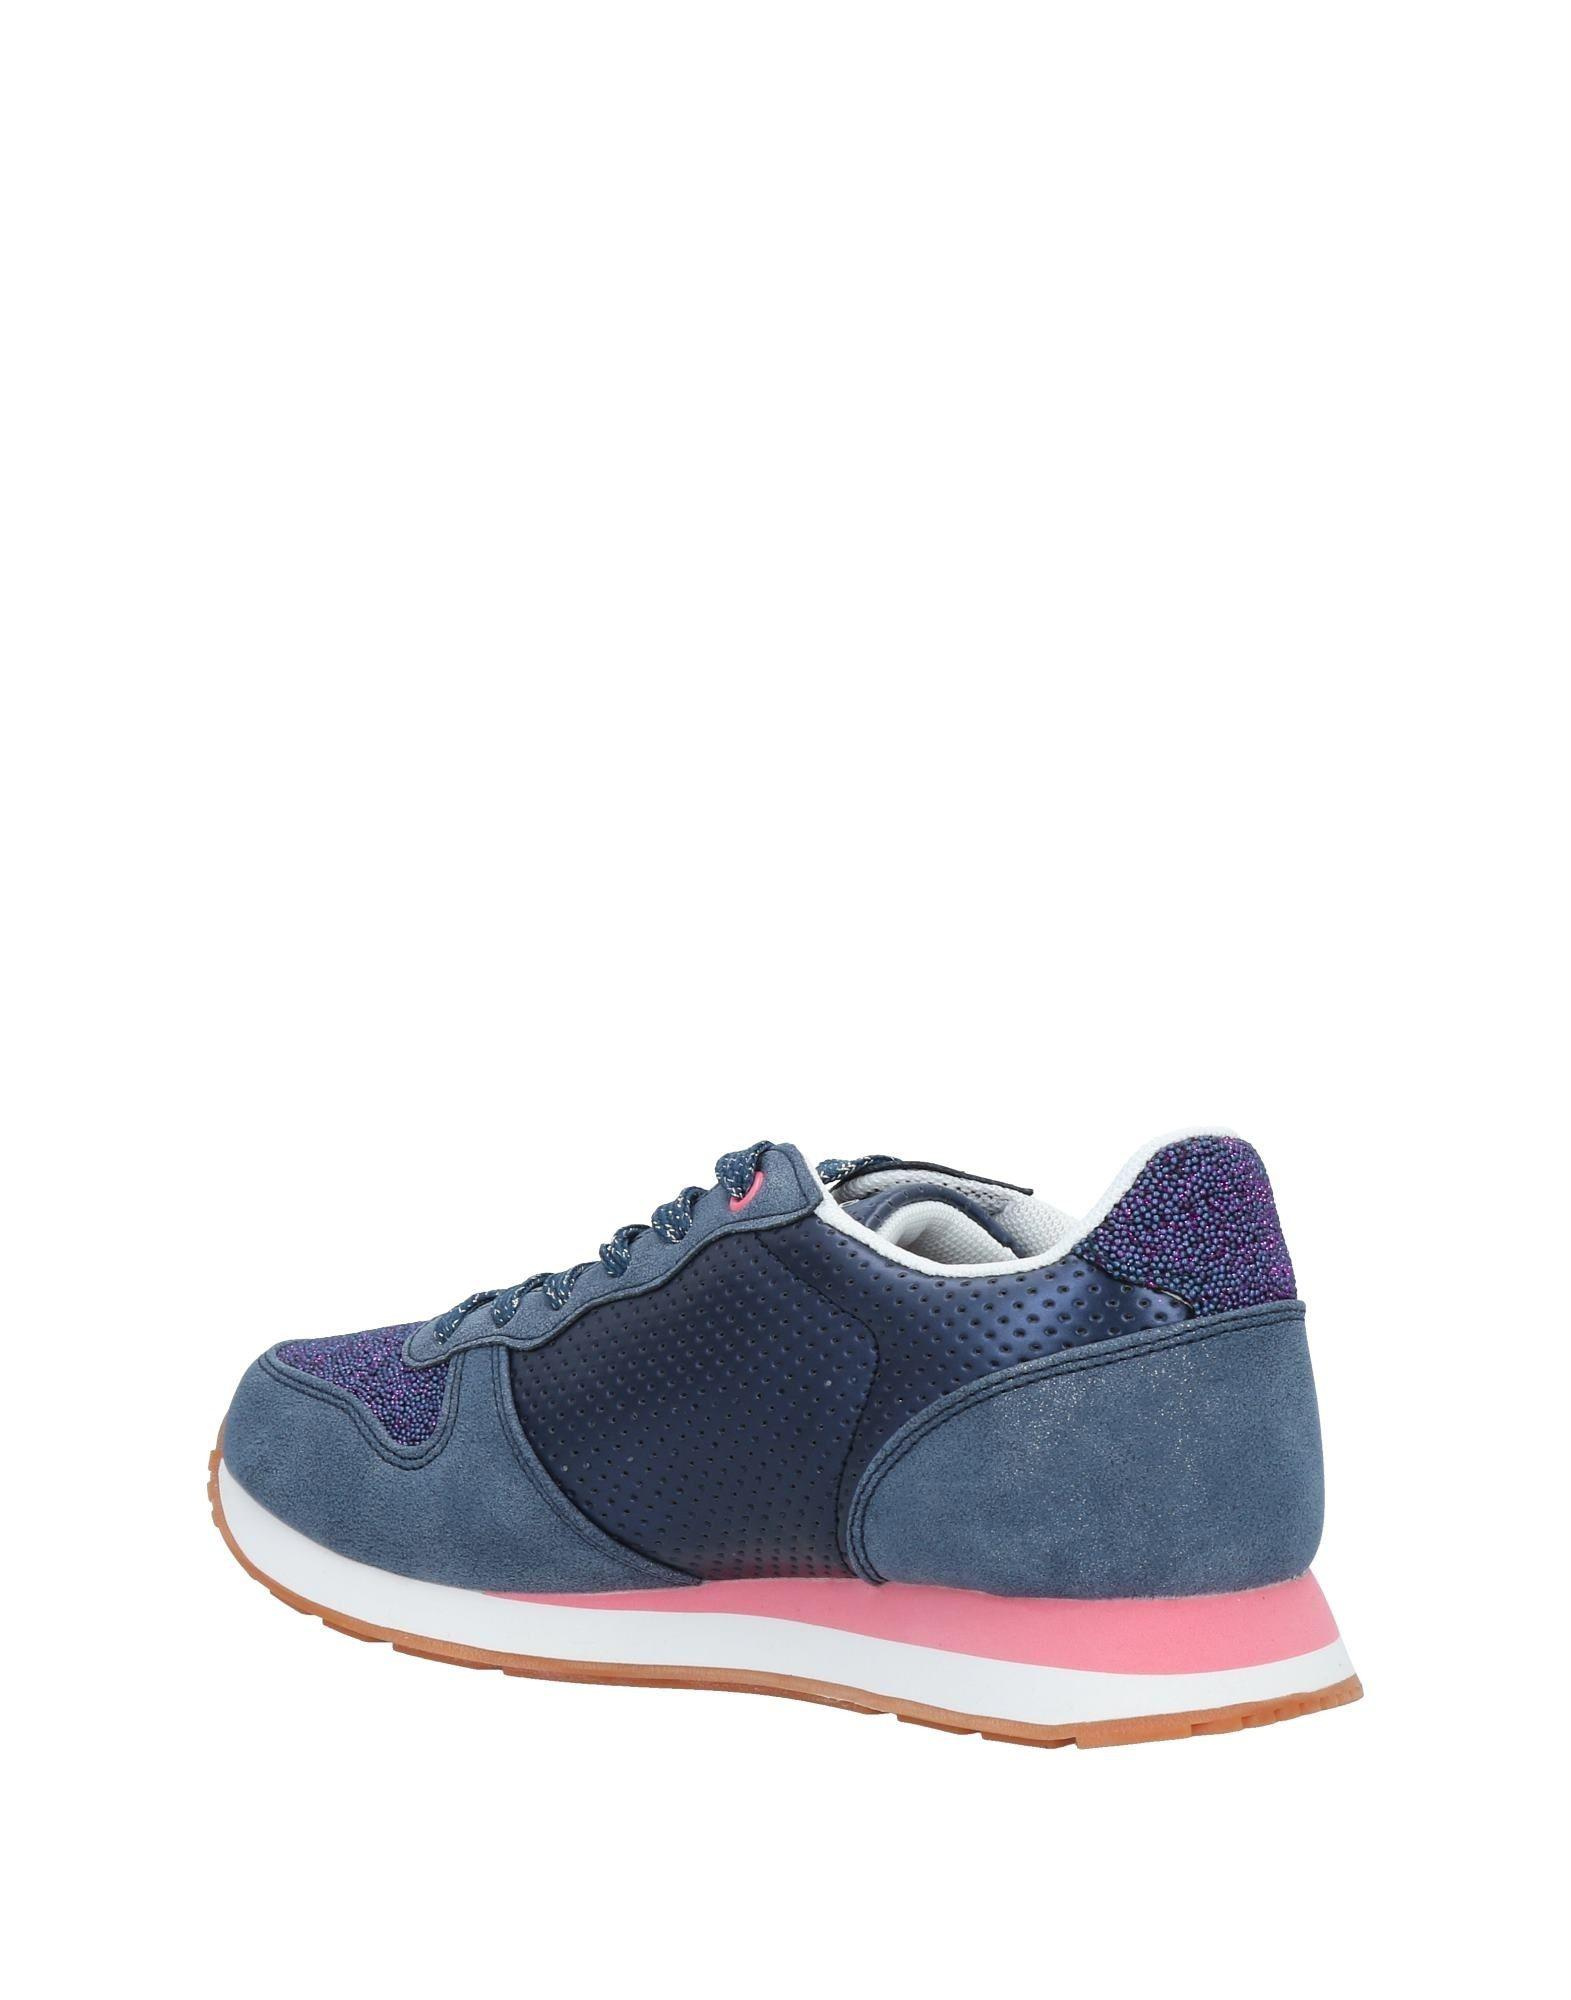 U.S. POLO ASSN. Synthetic Low-tops & Sneakers in Slate Blue (Blue)